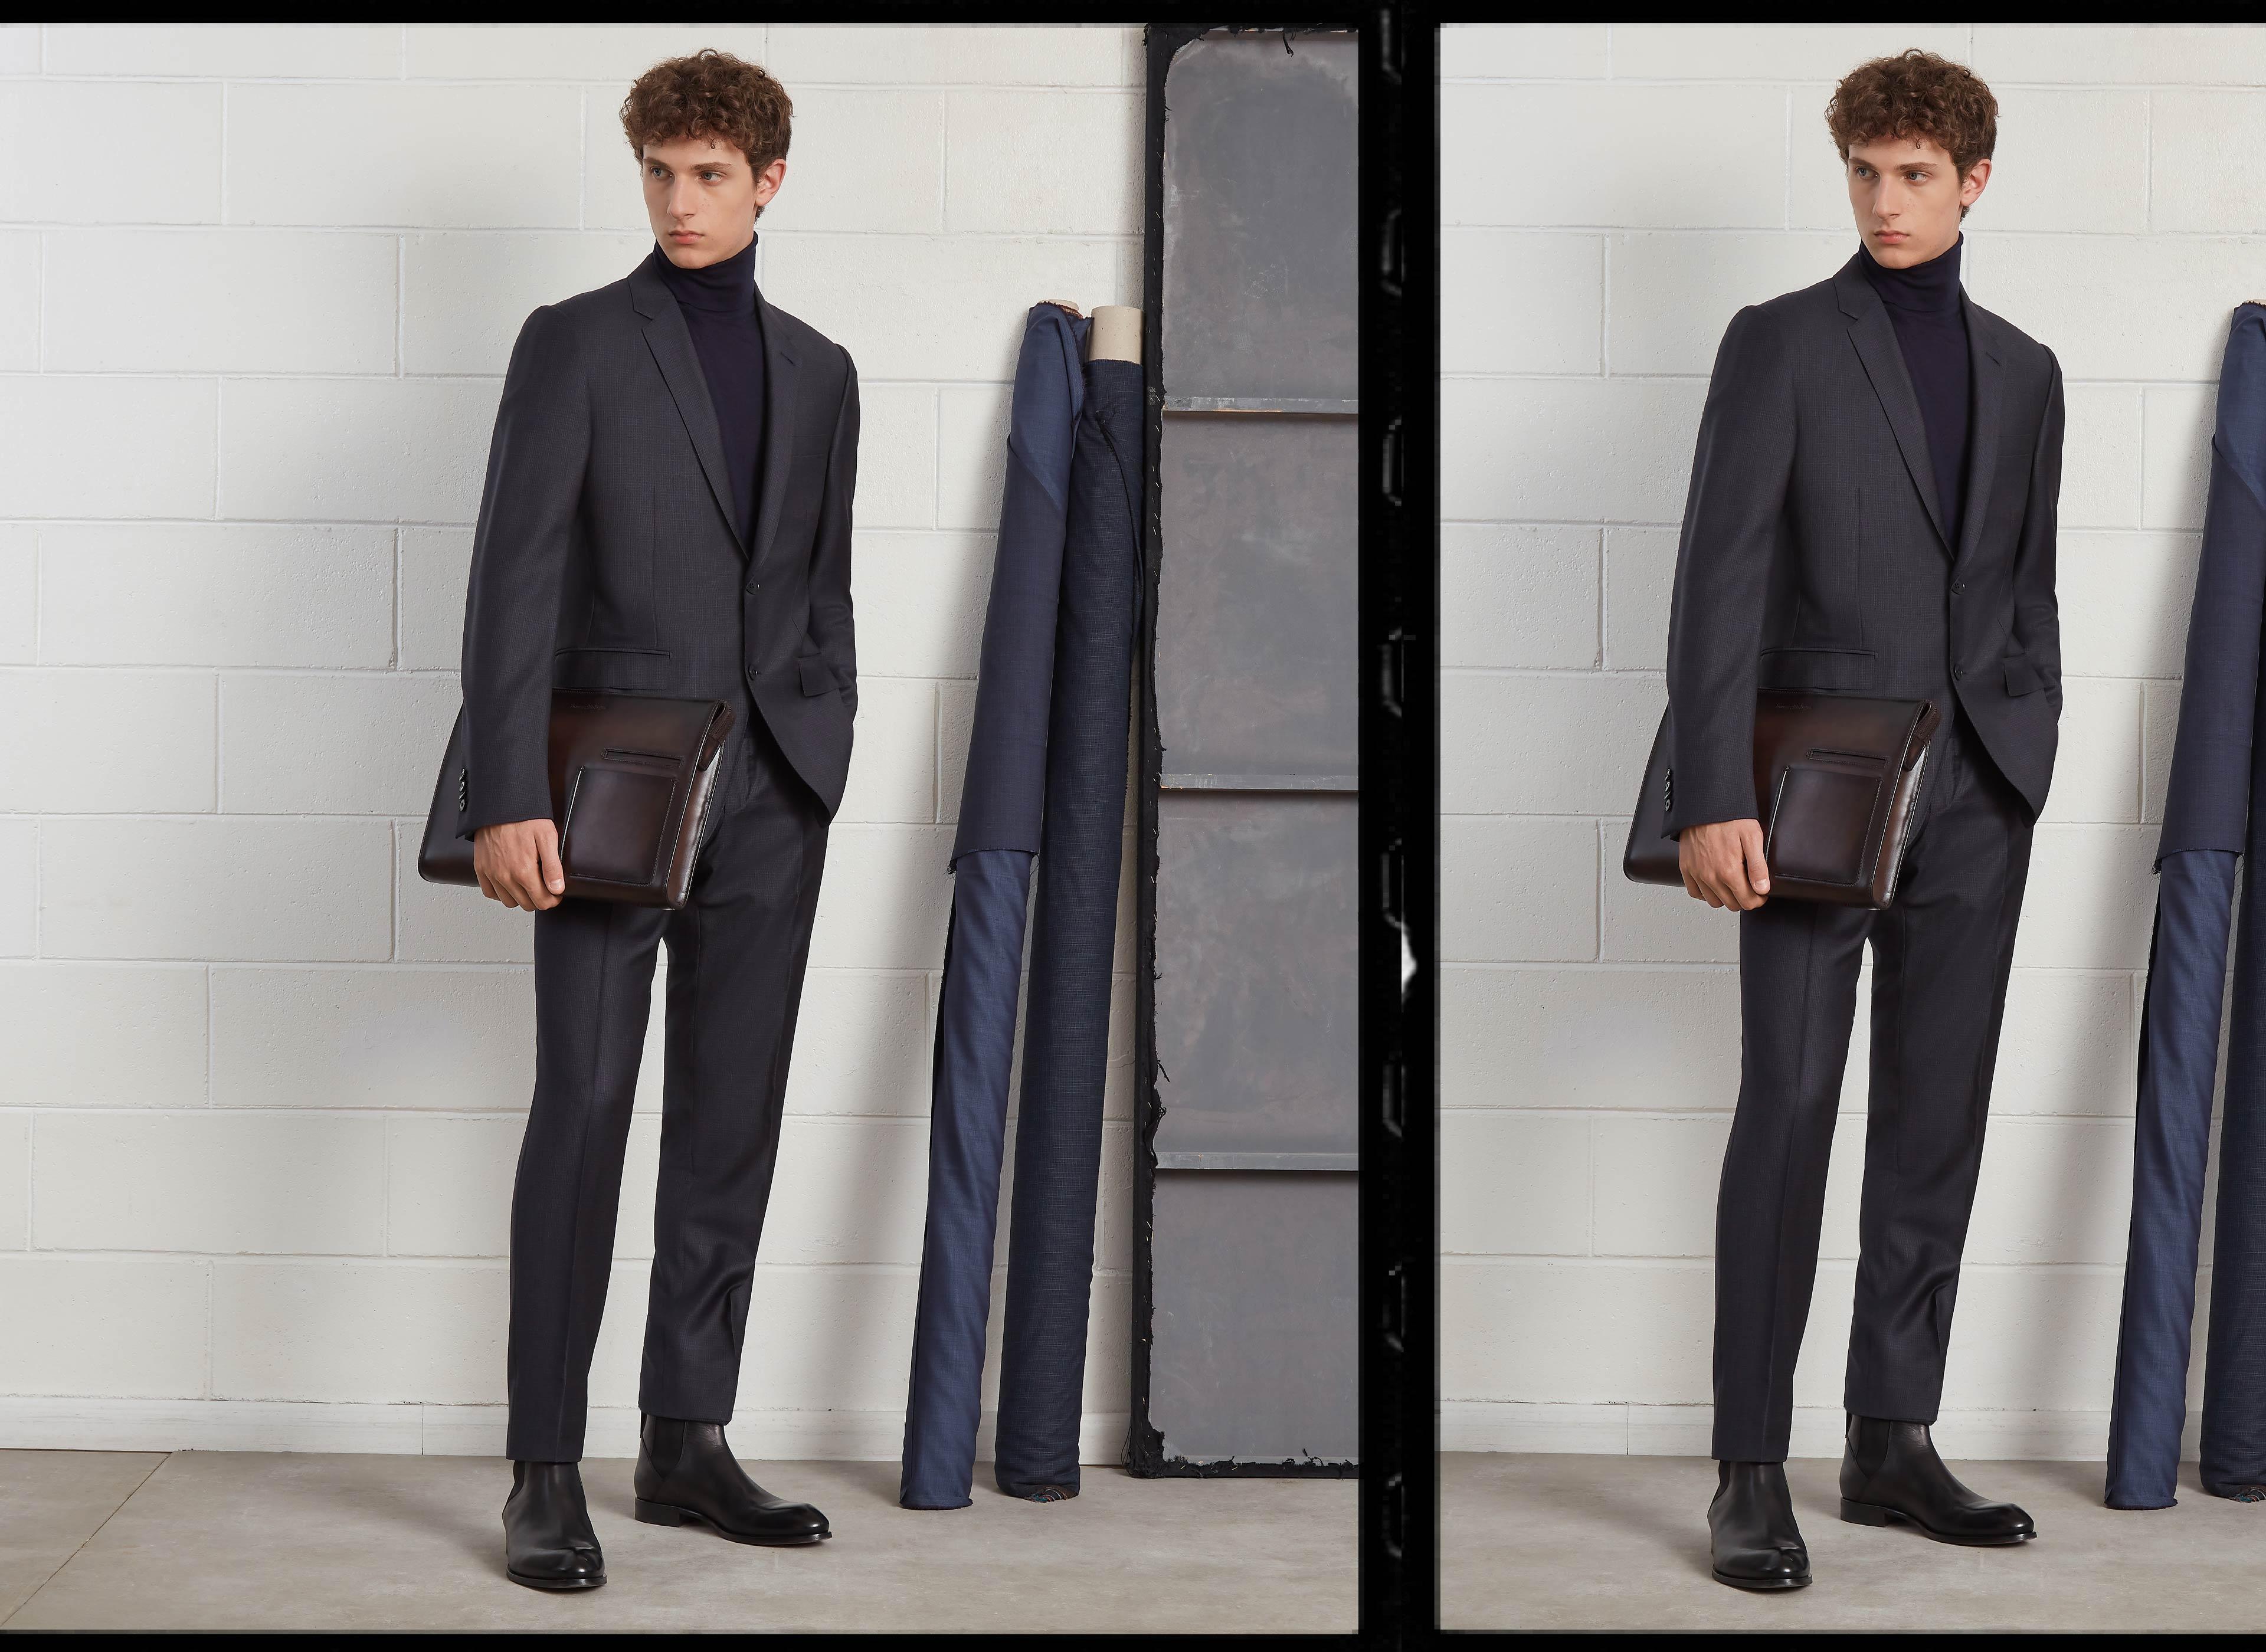 formal dress in winter for men,formal men formal official dress,